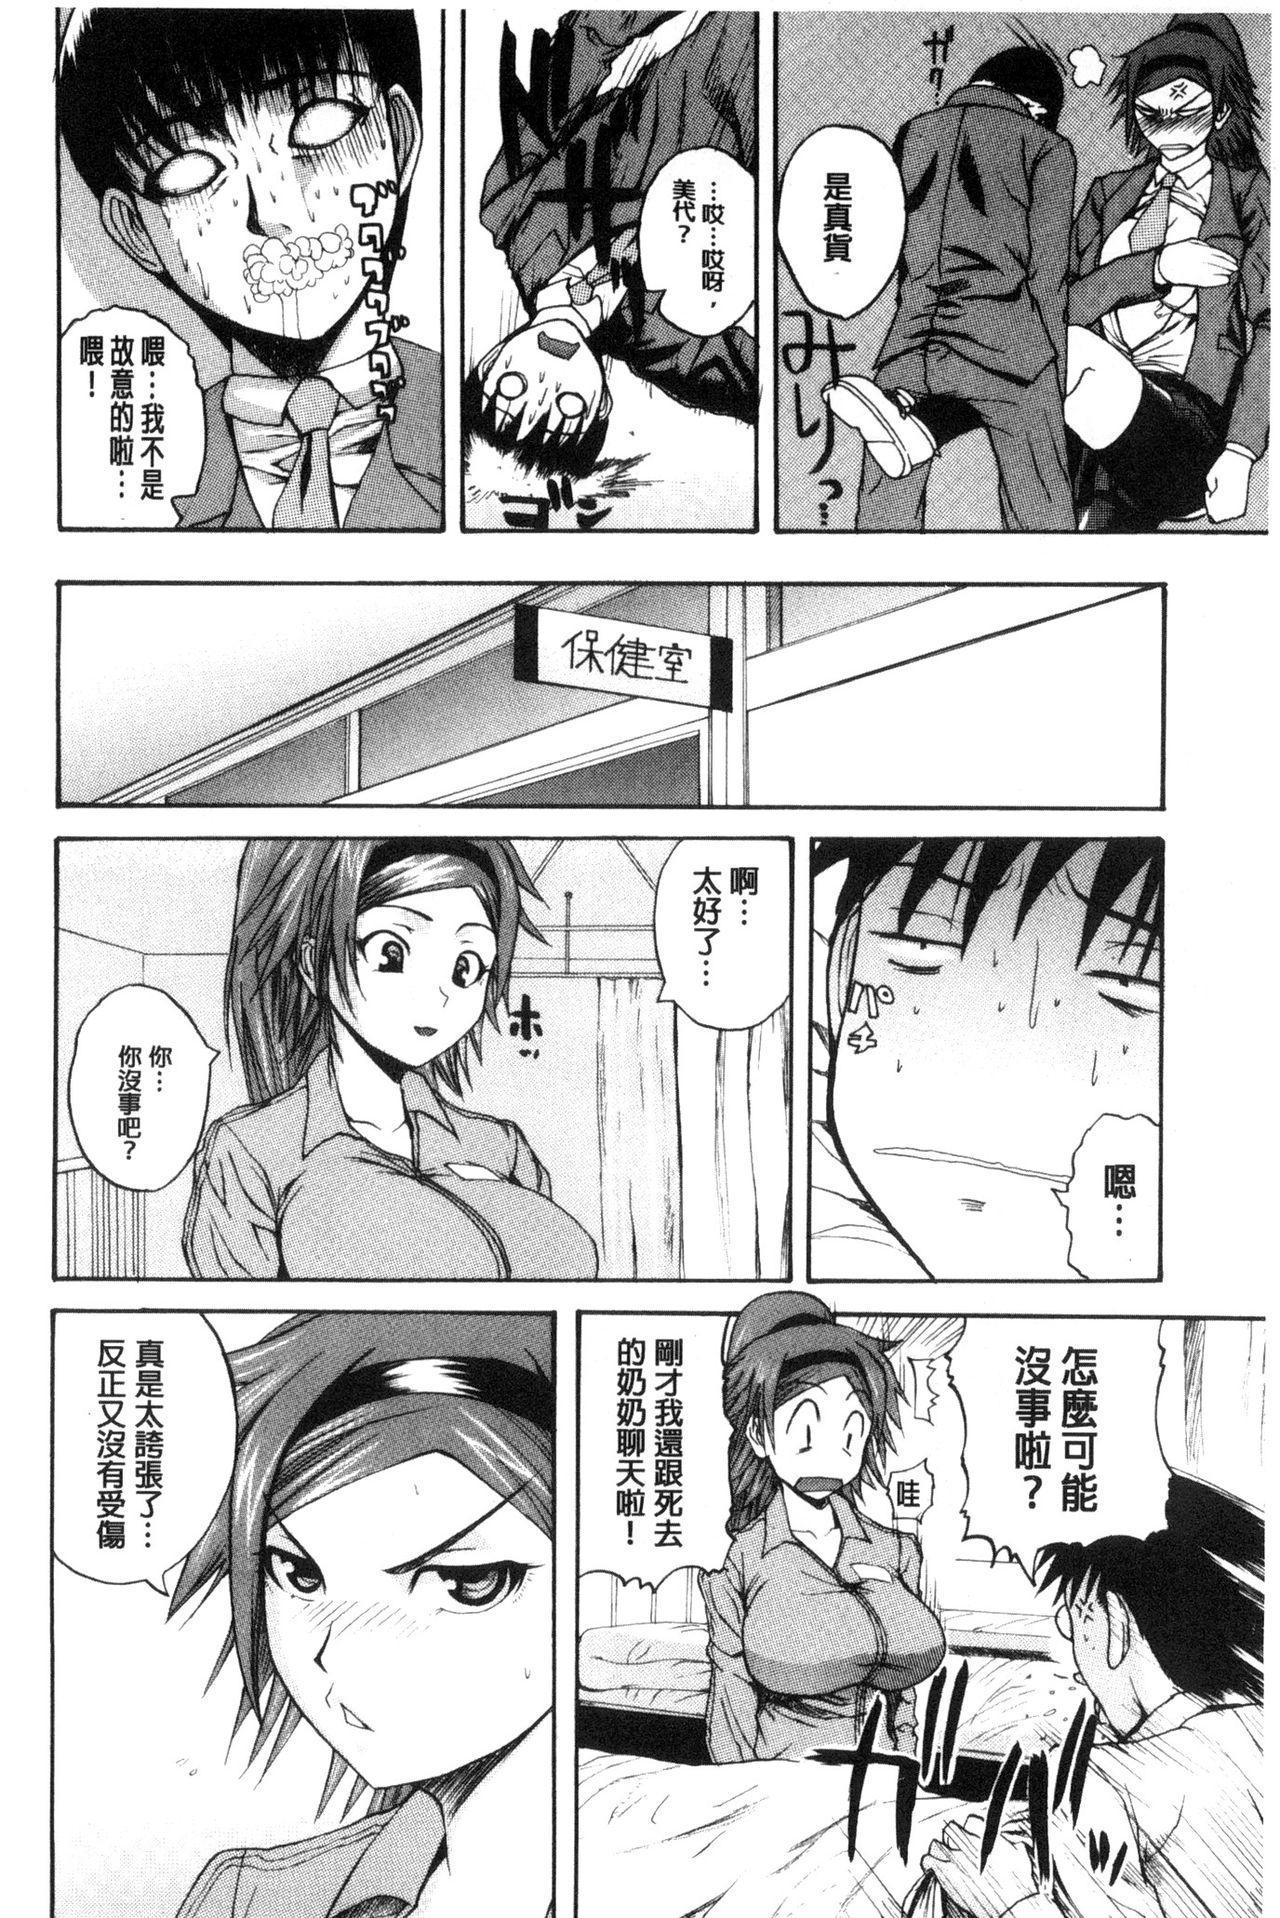 Opink Health Seibo no Fukuin 192